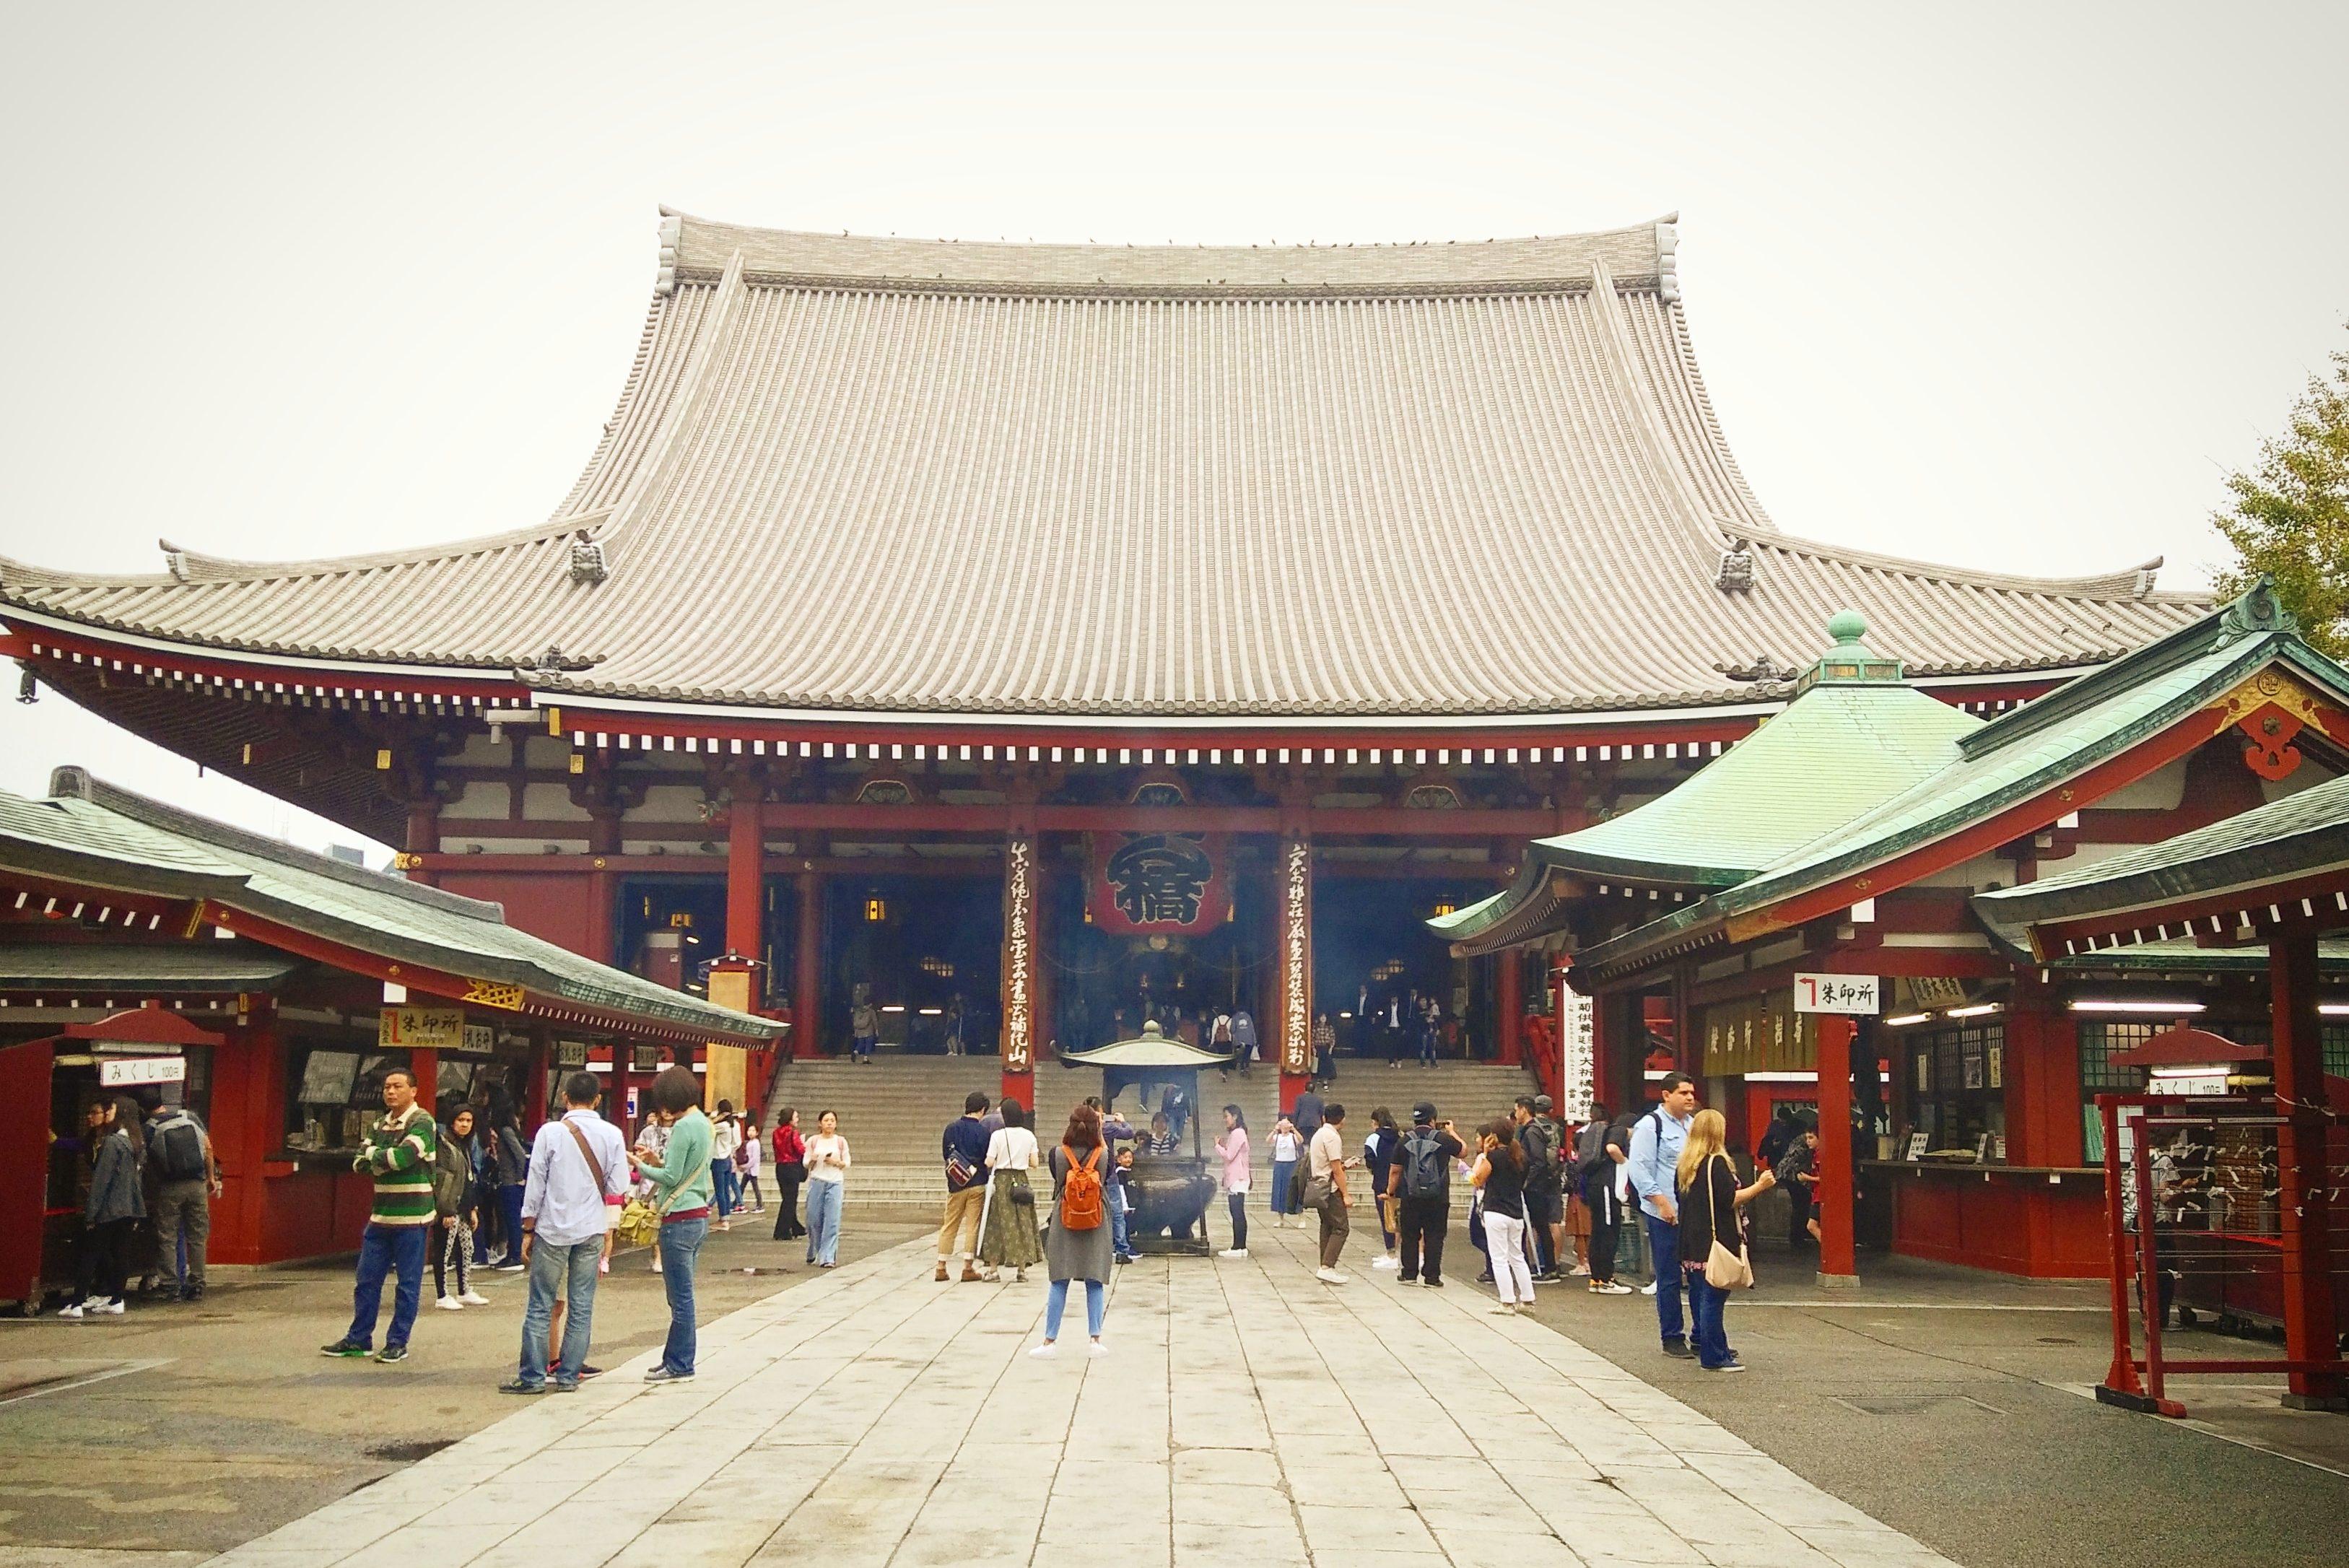 The Asakusa tour: History, traditions and harmony